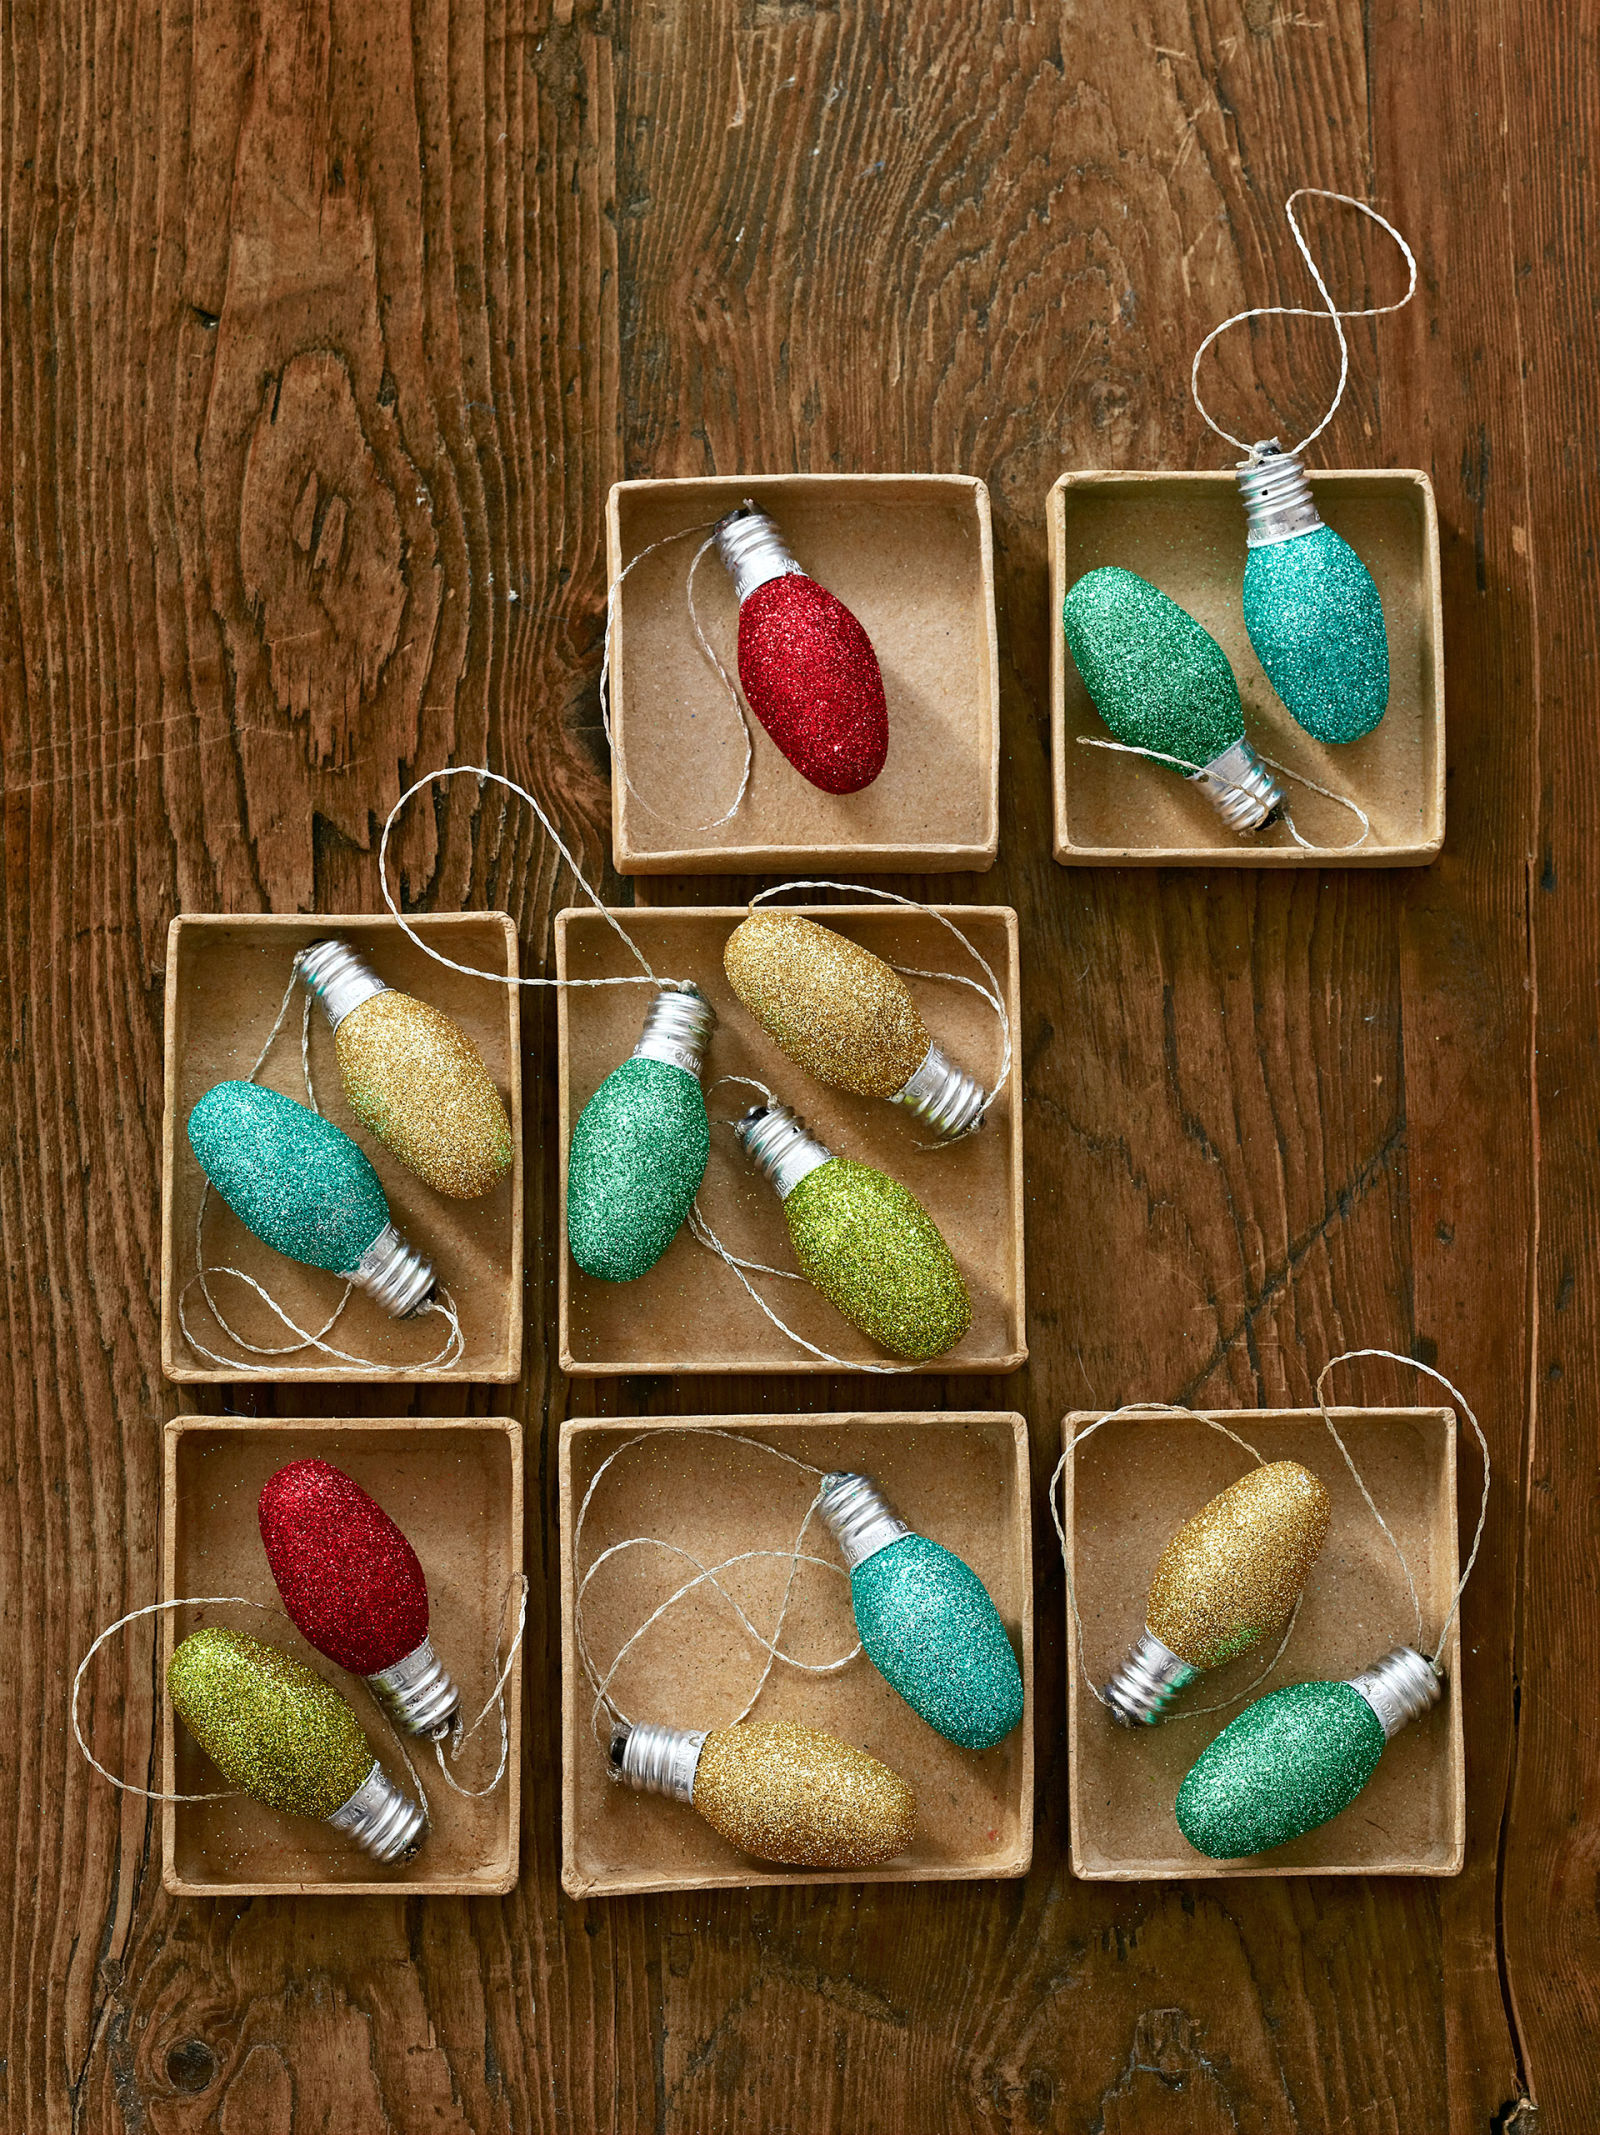 Homemade paper christmas decorations - 50 Homemade Christmas Ornaments Diy Handmade Holiday Tree Ornament Craft Ideas